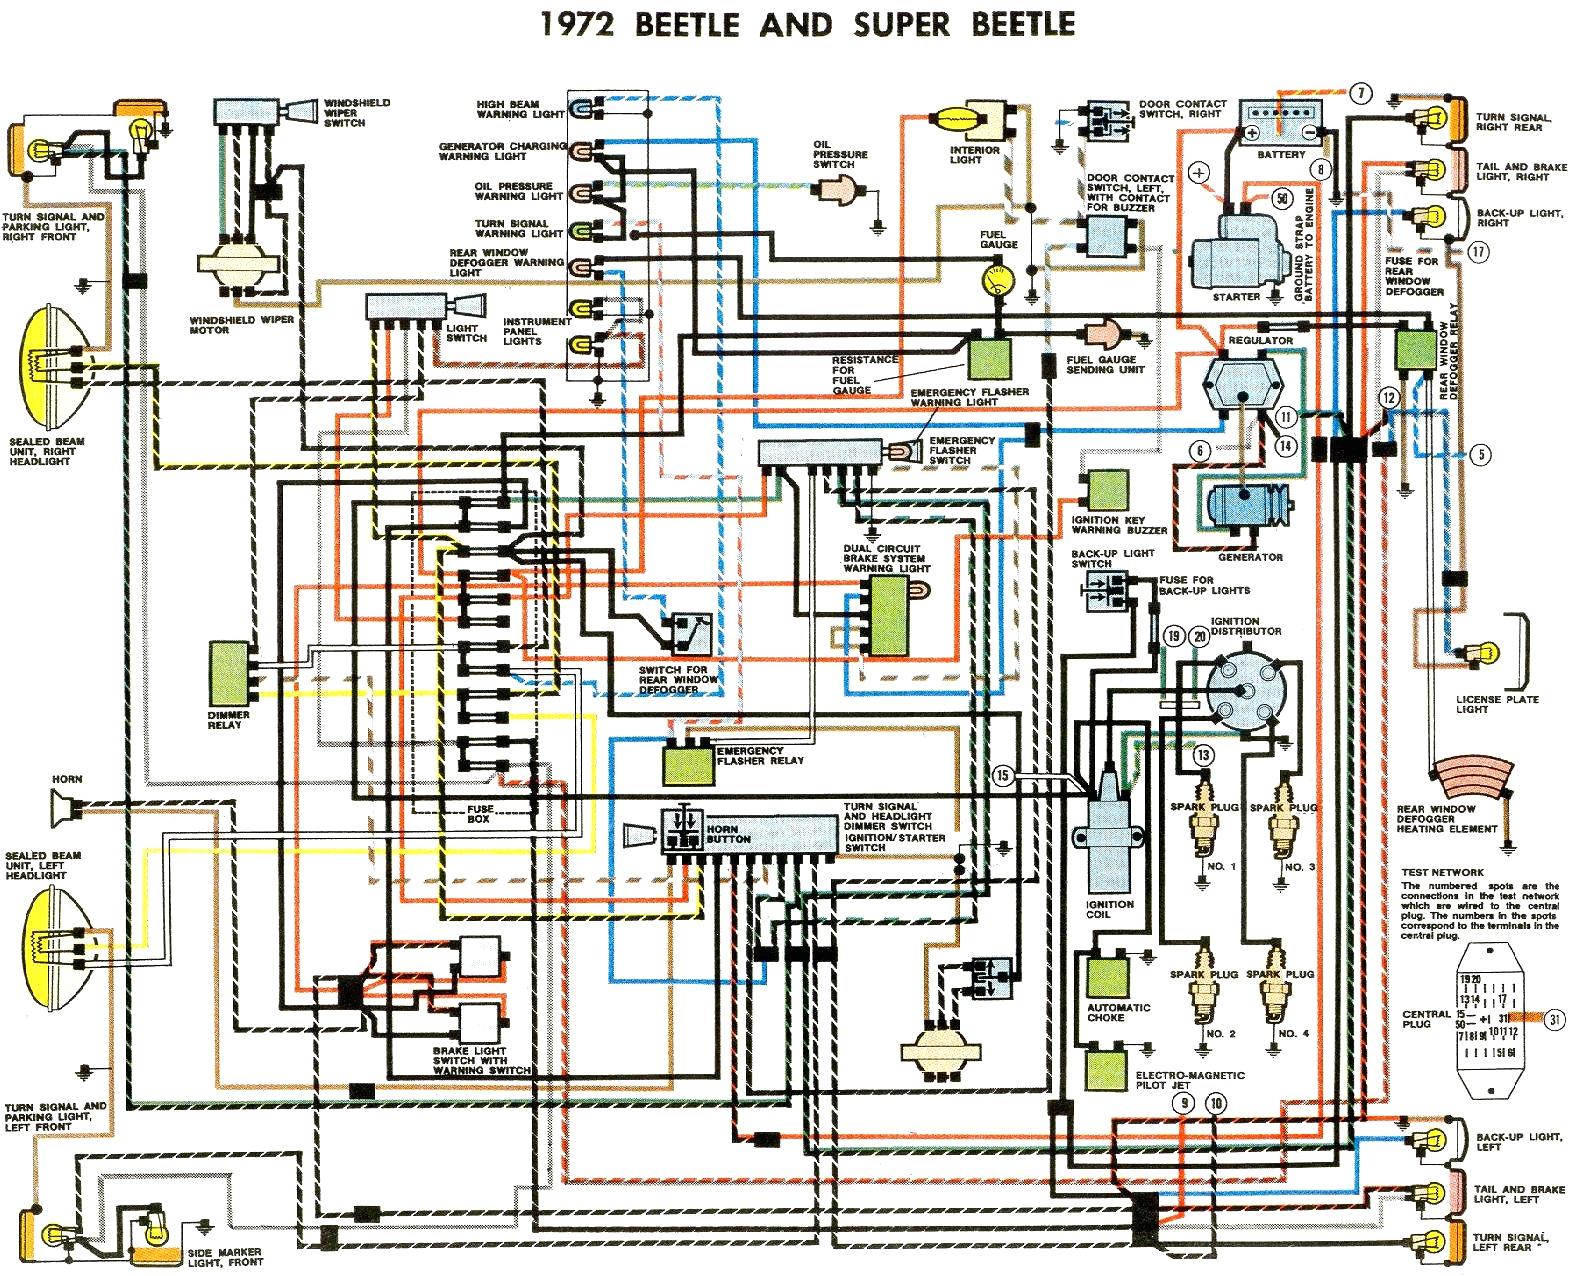 73 beetle wiring diagram wiring diagram centre vw